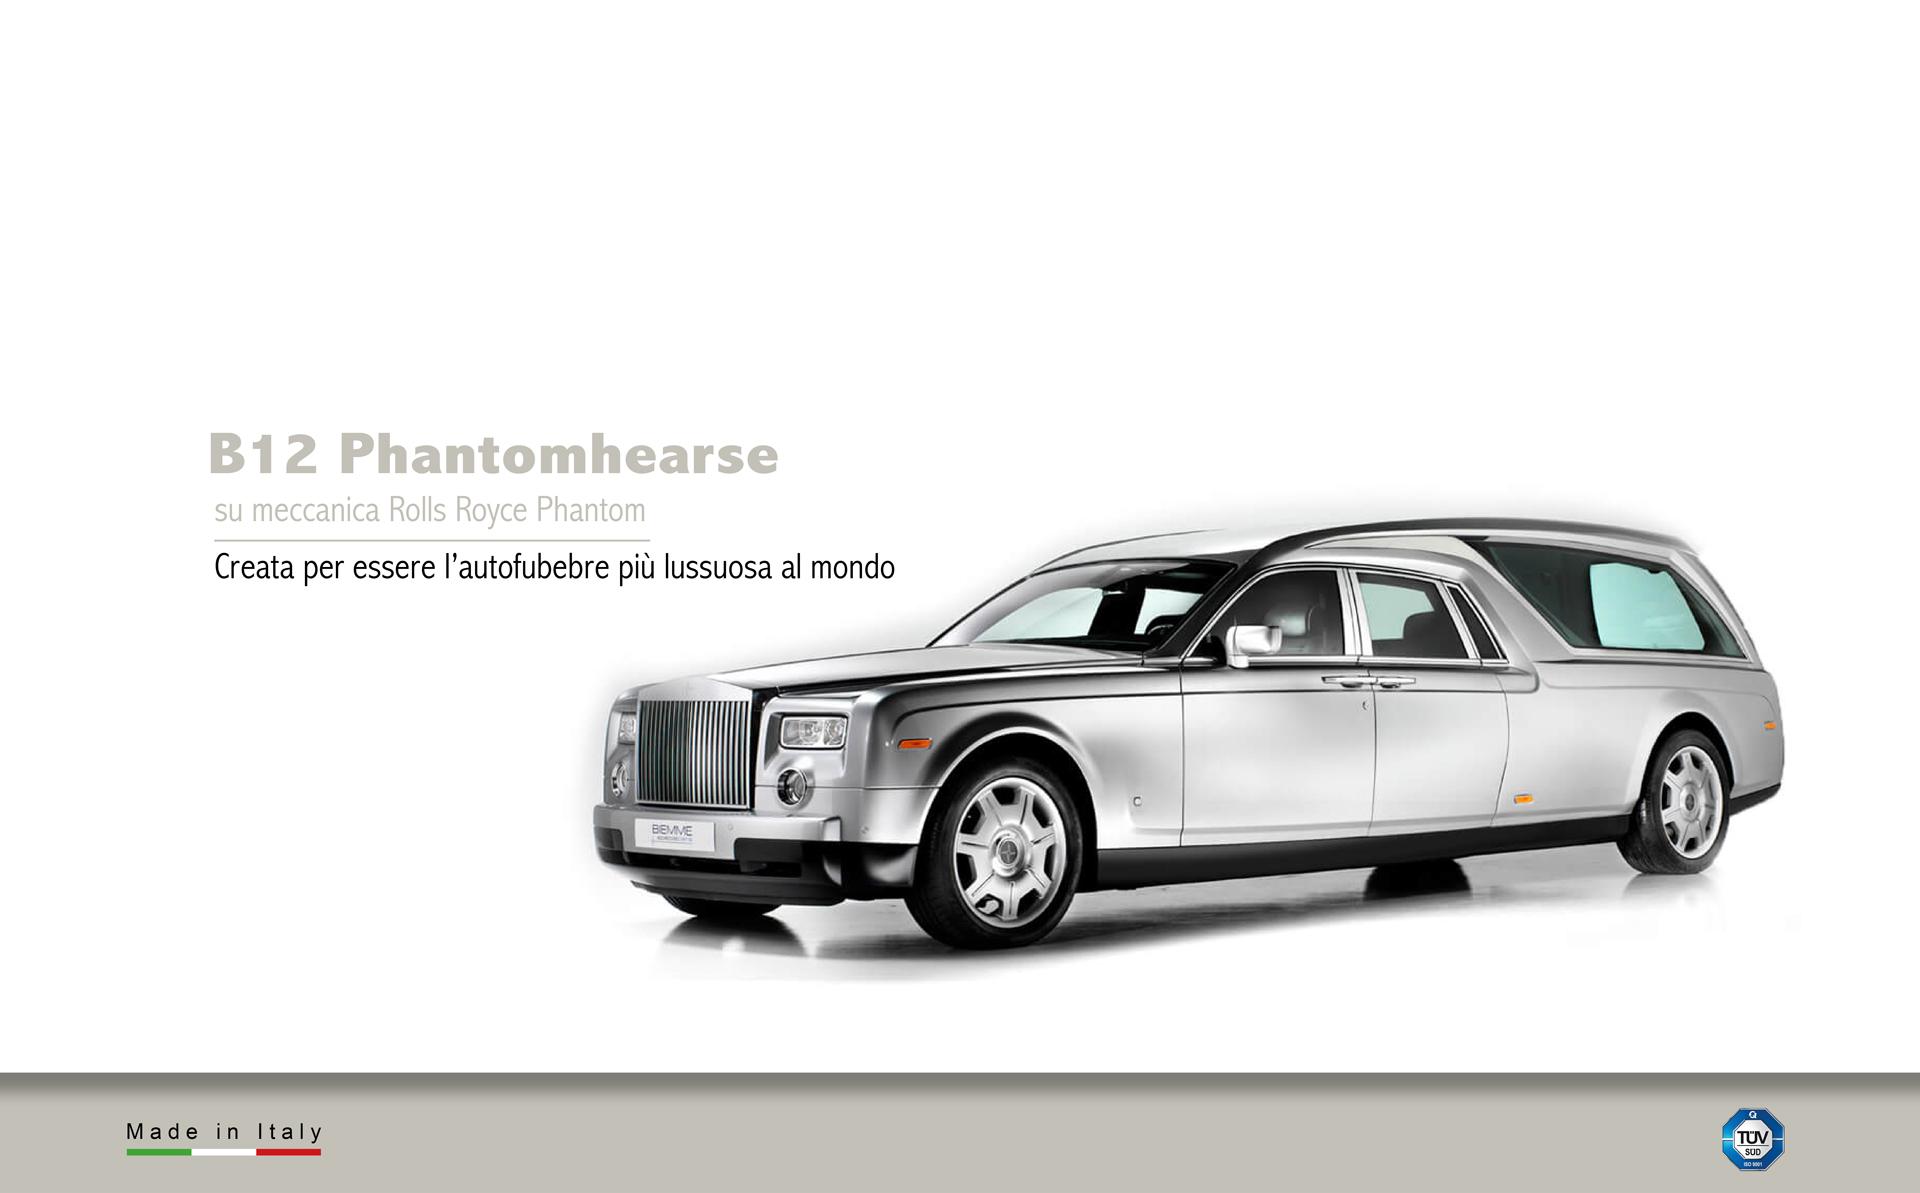 hearses dricuri corbillards Rolls Royce